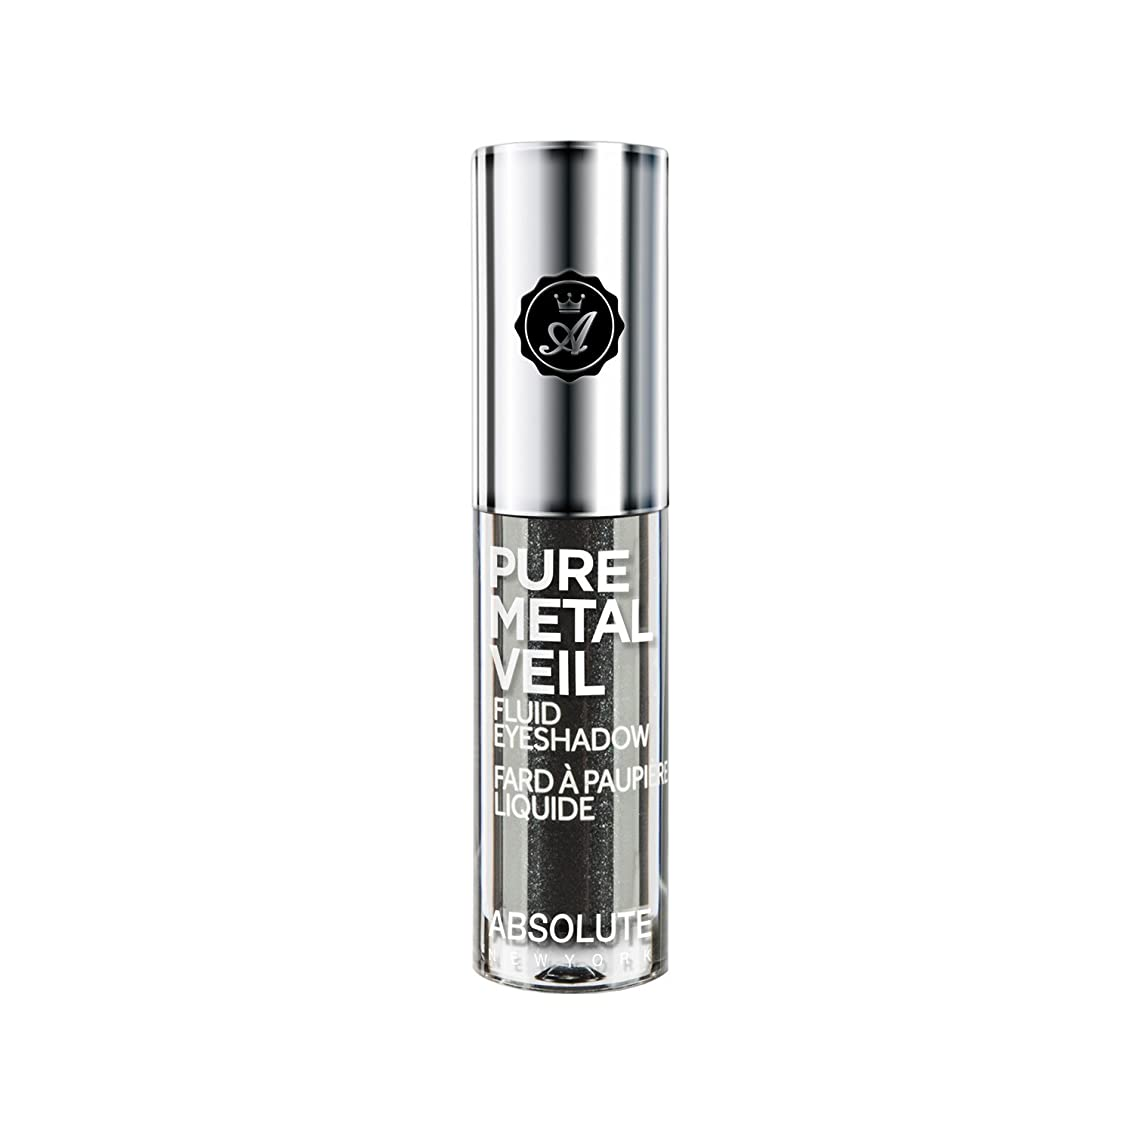 修士号騒乱定期的ABSOLUTE Pure Metal Veil Fluid Eyeshadow - Gunmetal (並行輸入品)